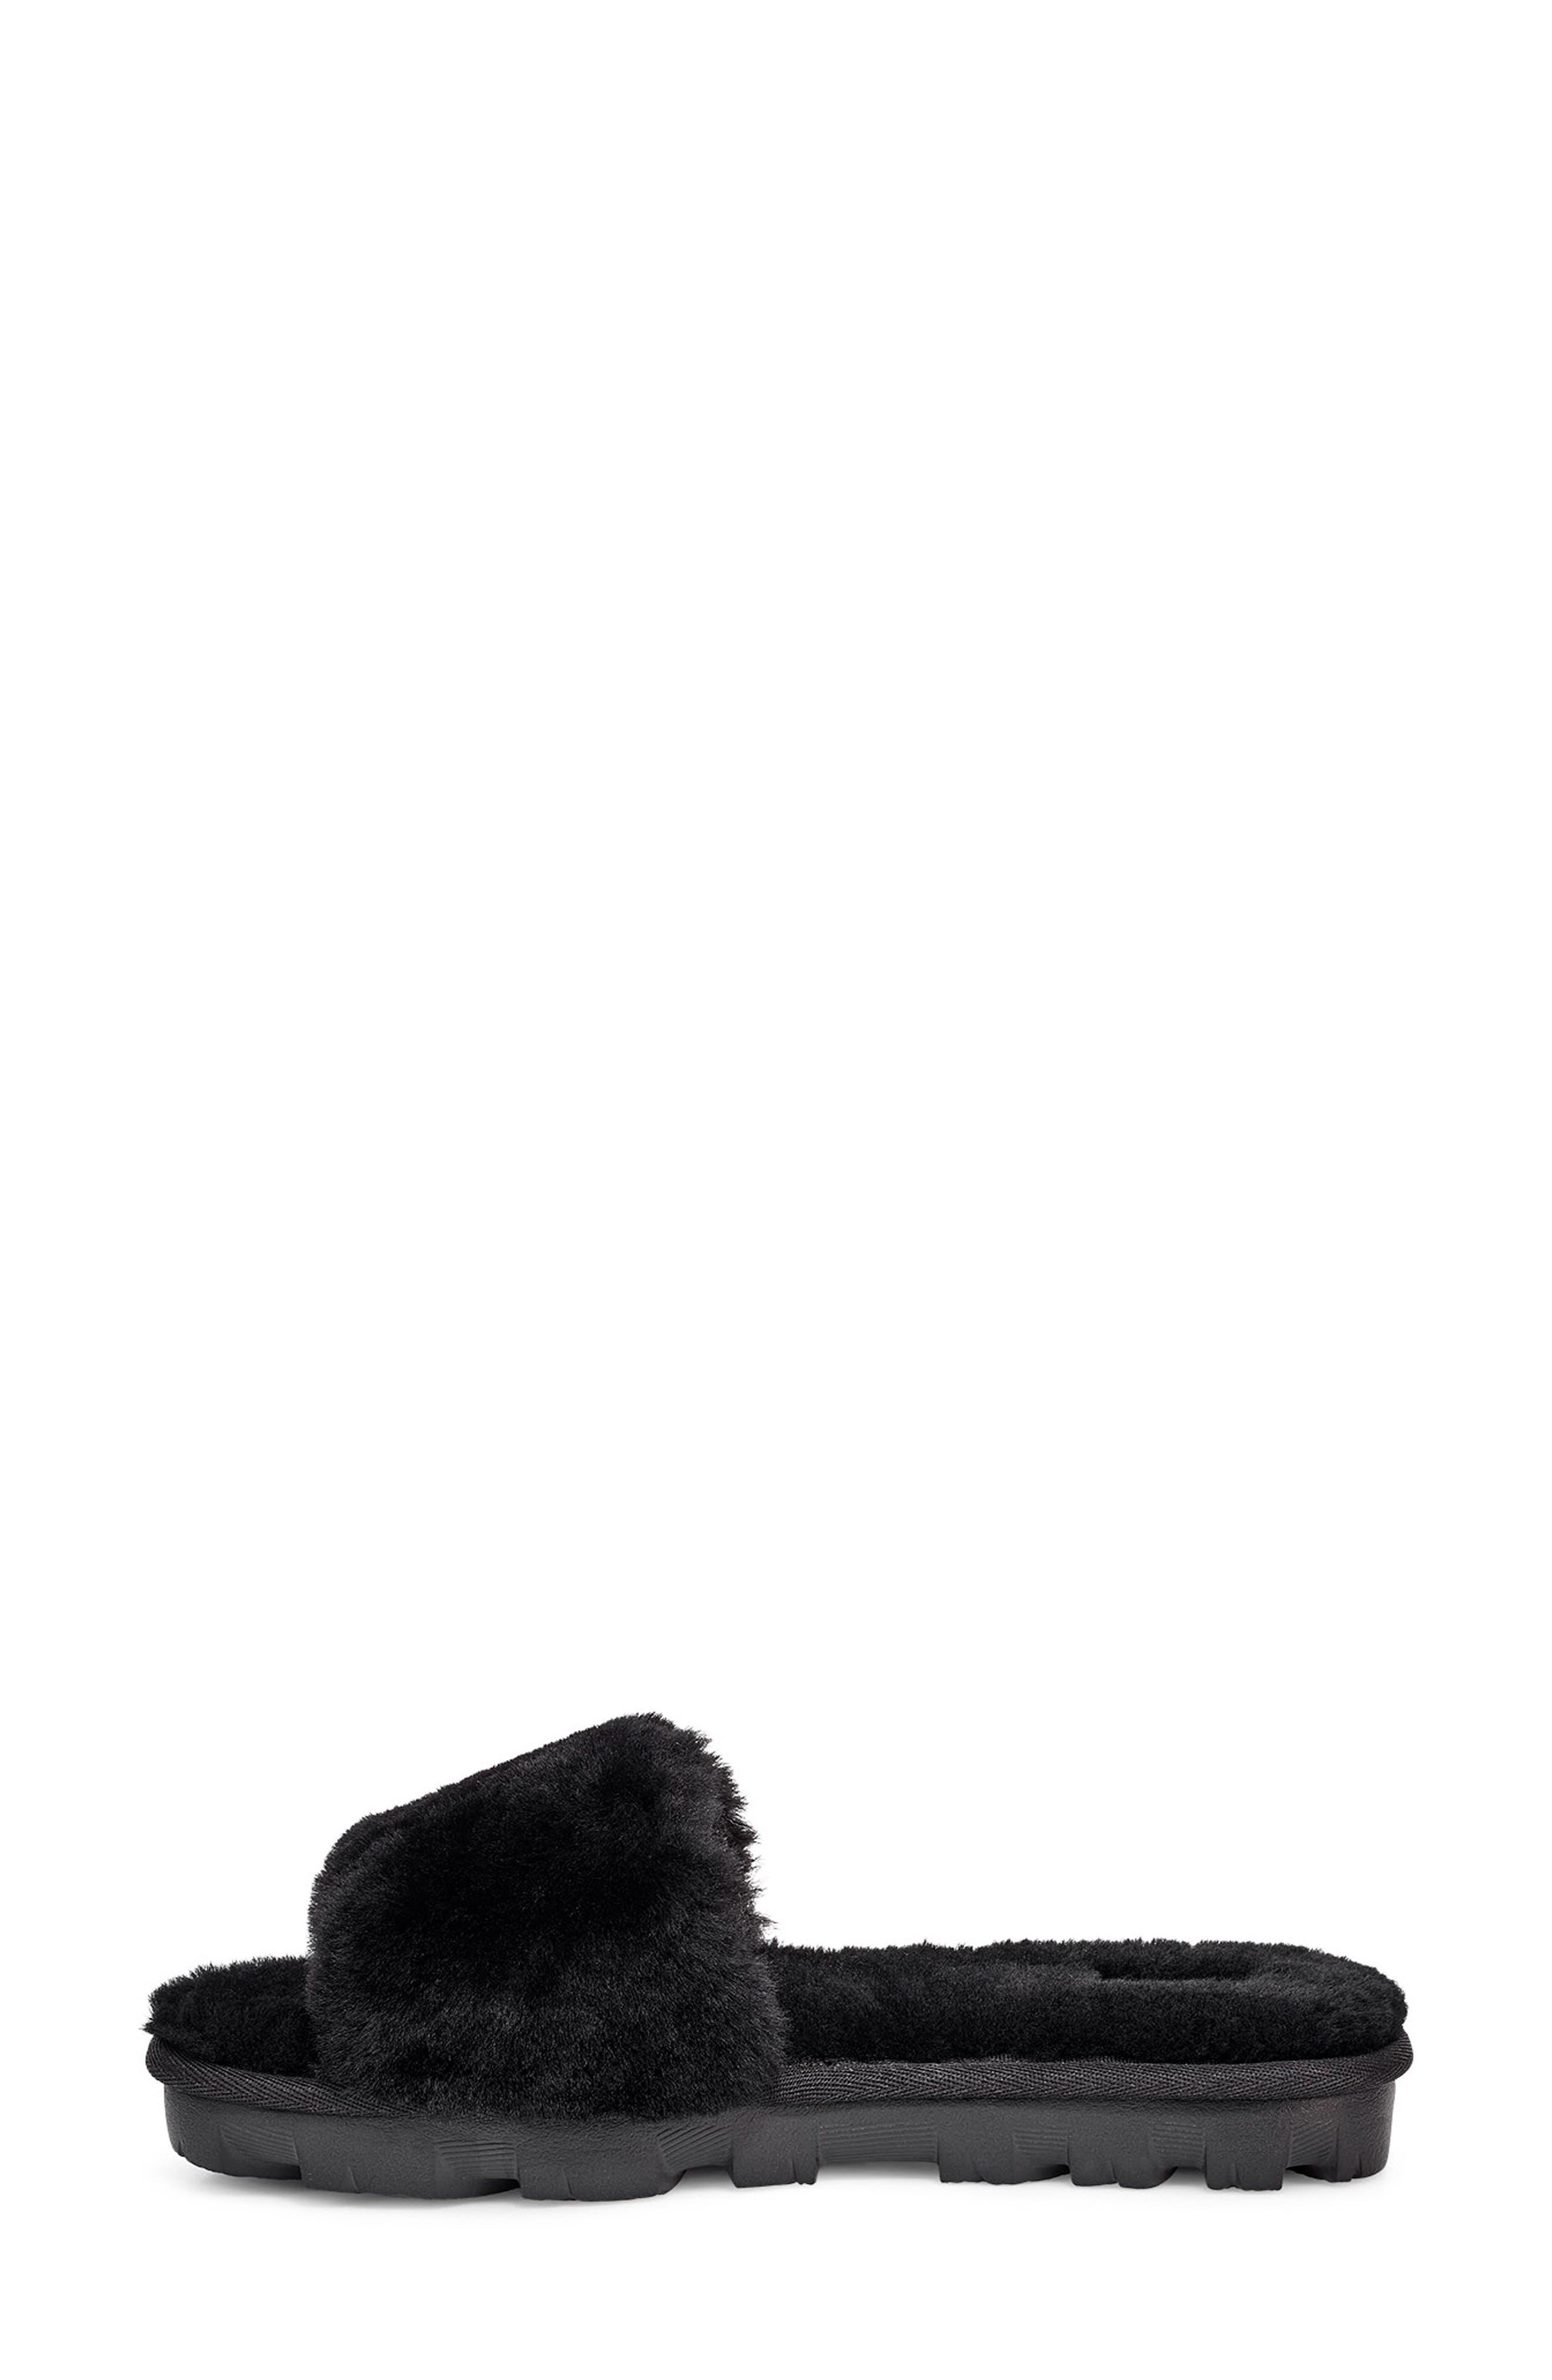 Cosette Genuine Shearling Slipper,                             Alternate thumbnail 6, color,                             BLACK